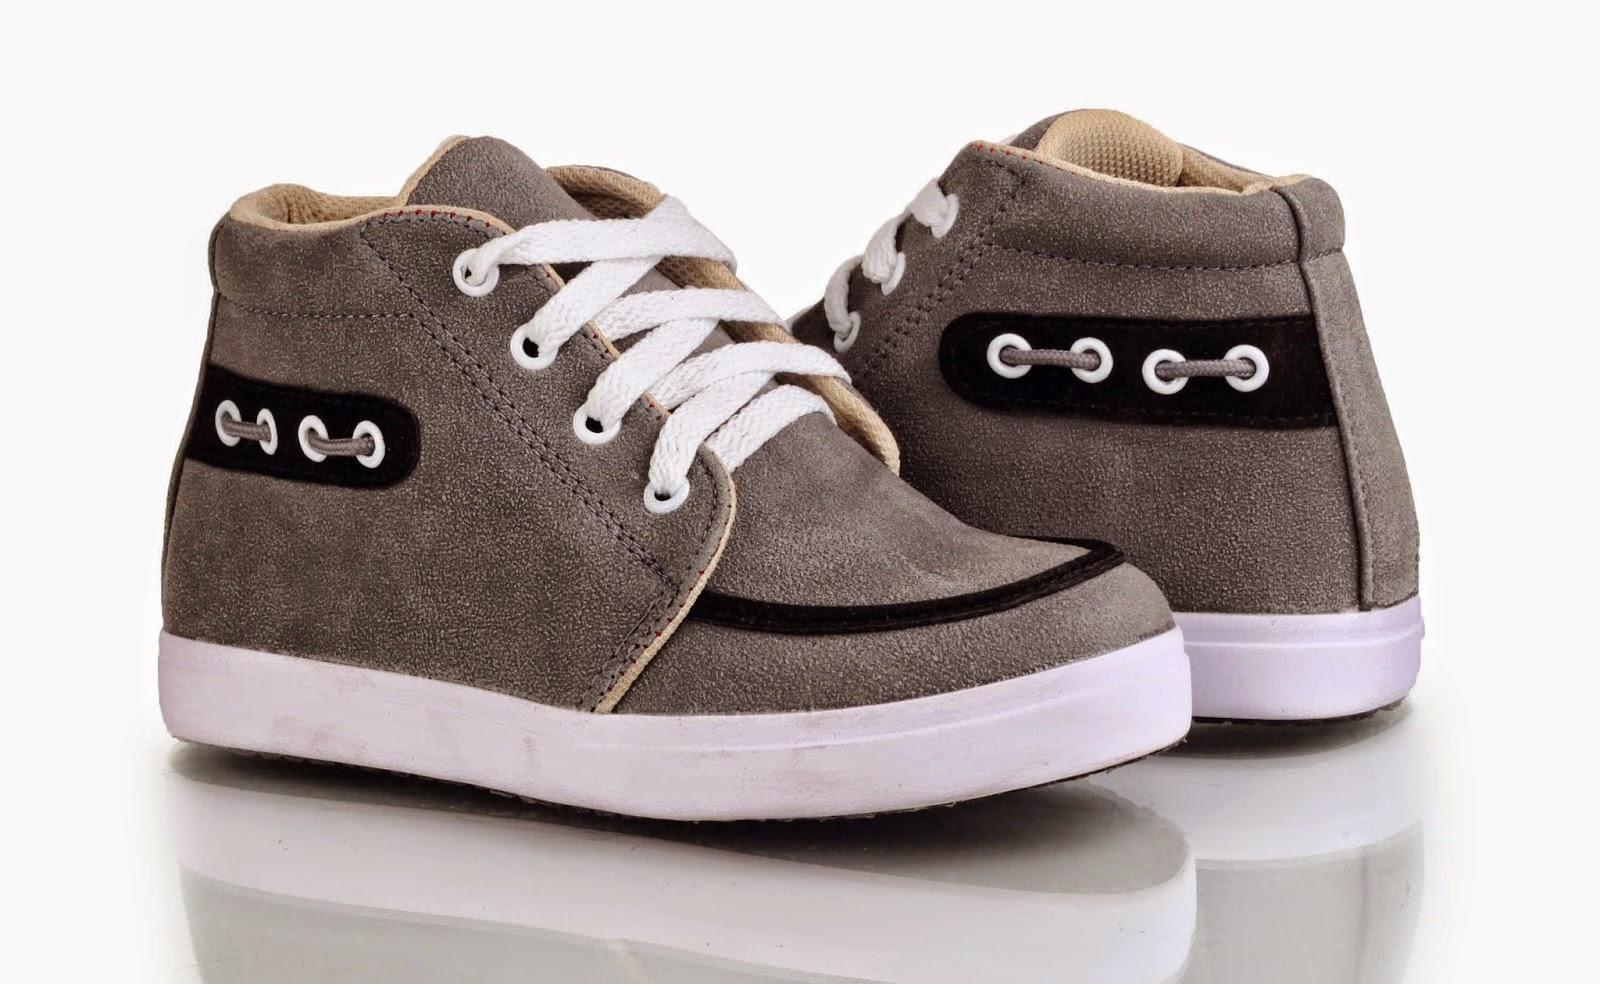 Tassepatu September 2015 Tas Ransel Sekolah Kuliah Laptop Cowok  Pulcher Gewiin Man Model Sepatu Olahraga Nike Terbaru Cara Membedakan Adidas Asli Original Dan